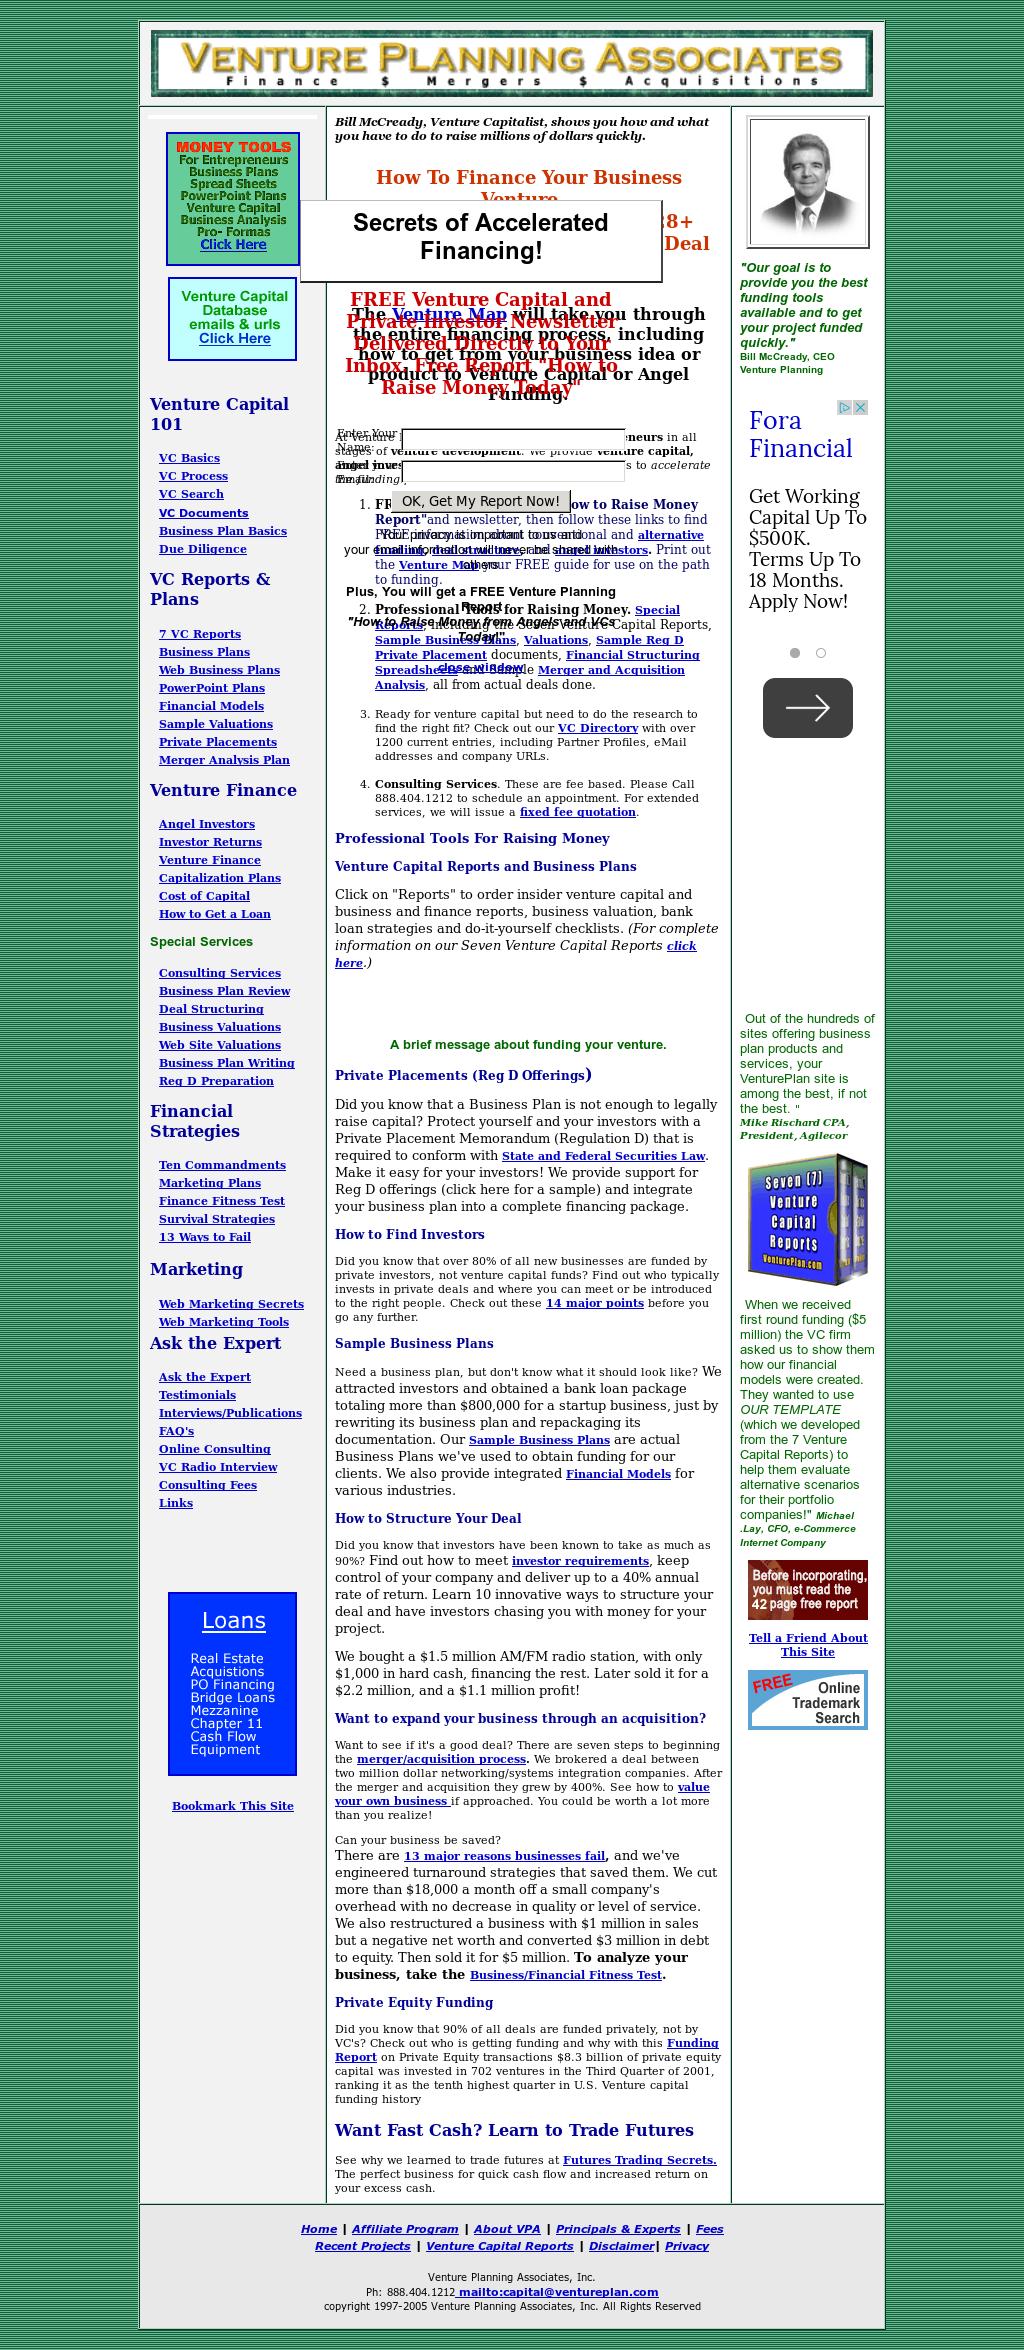 Venture Planning Associates Competitors, Revenue and Employees